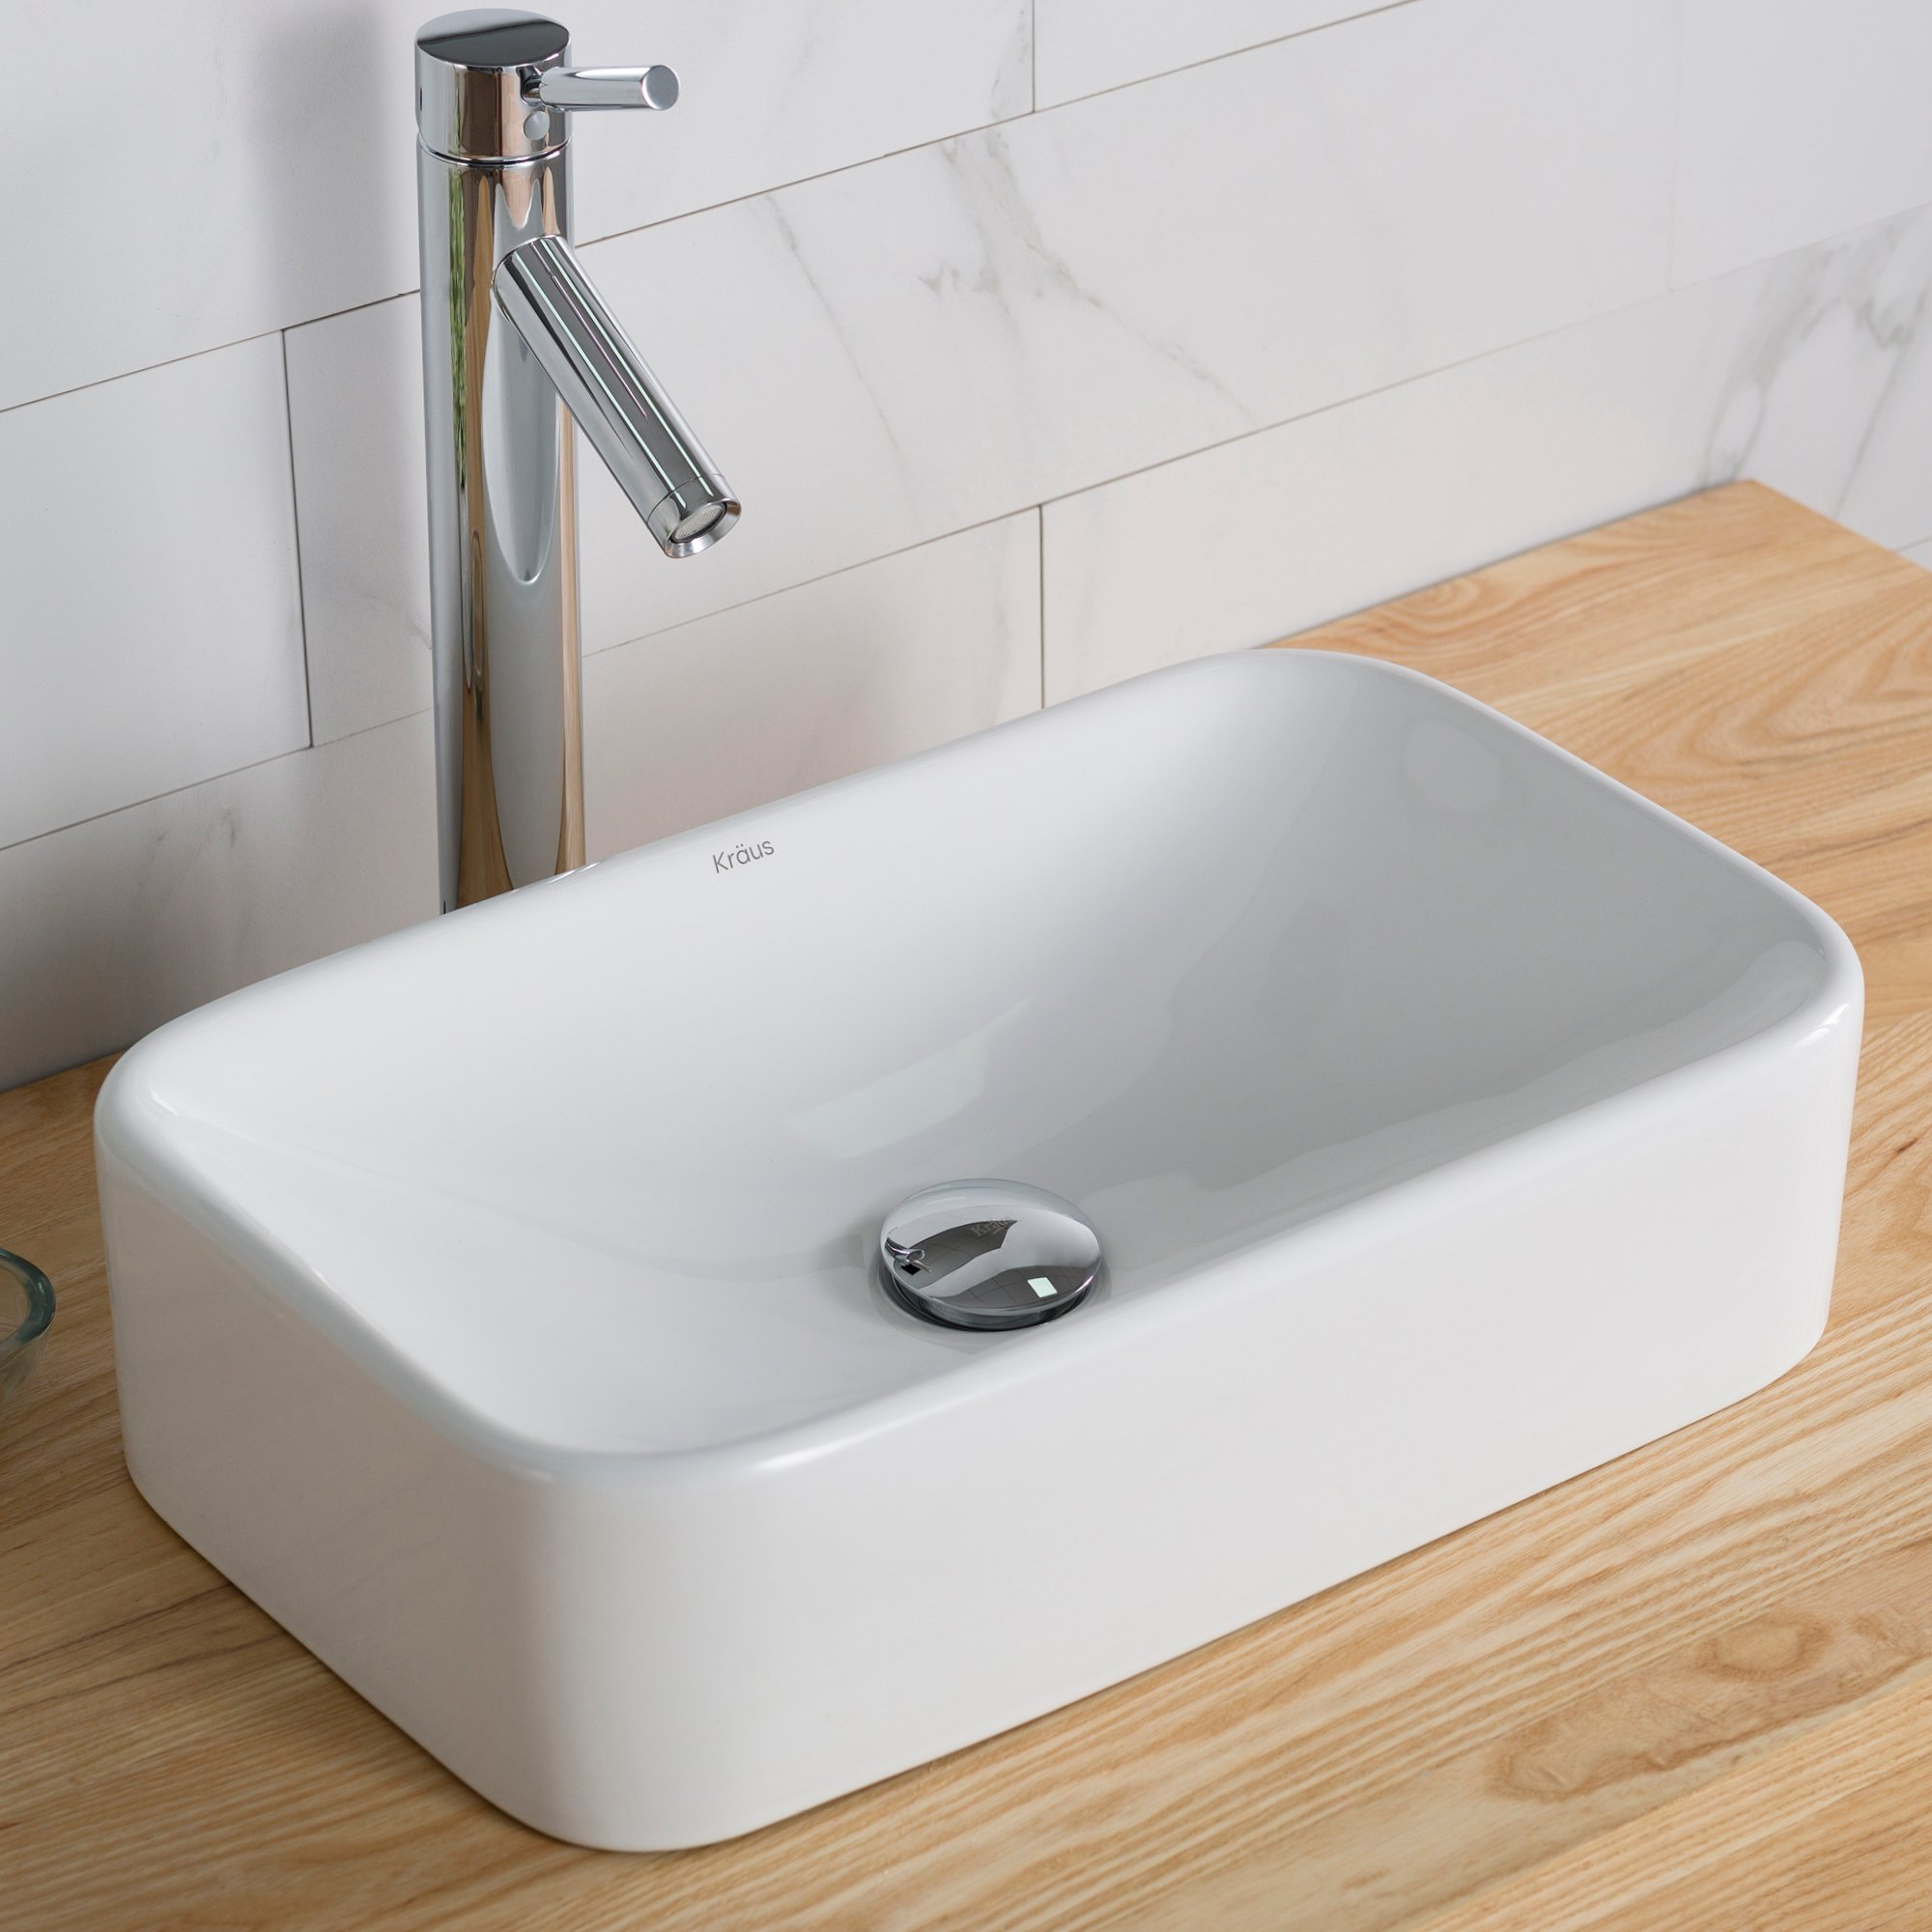 Kraus KCV-122 White Rectangular Ceramic Bathroom Sink